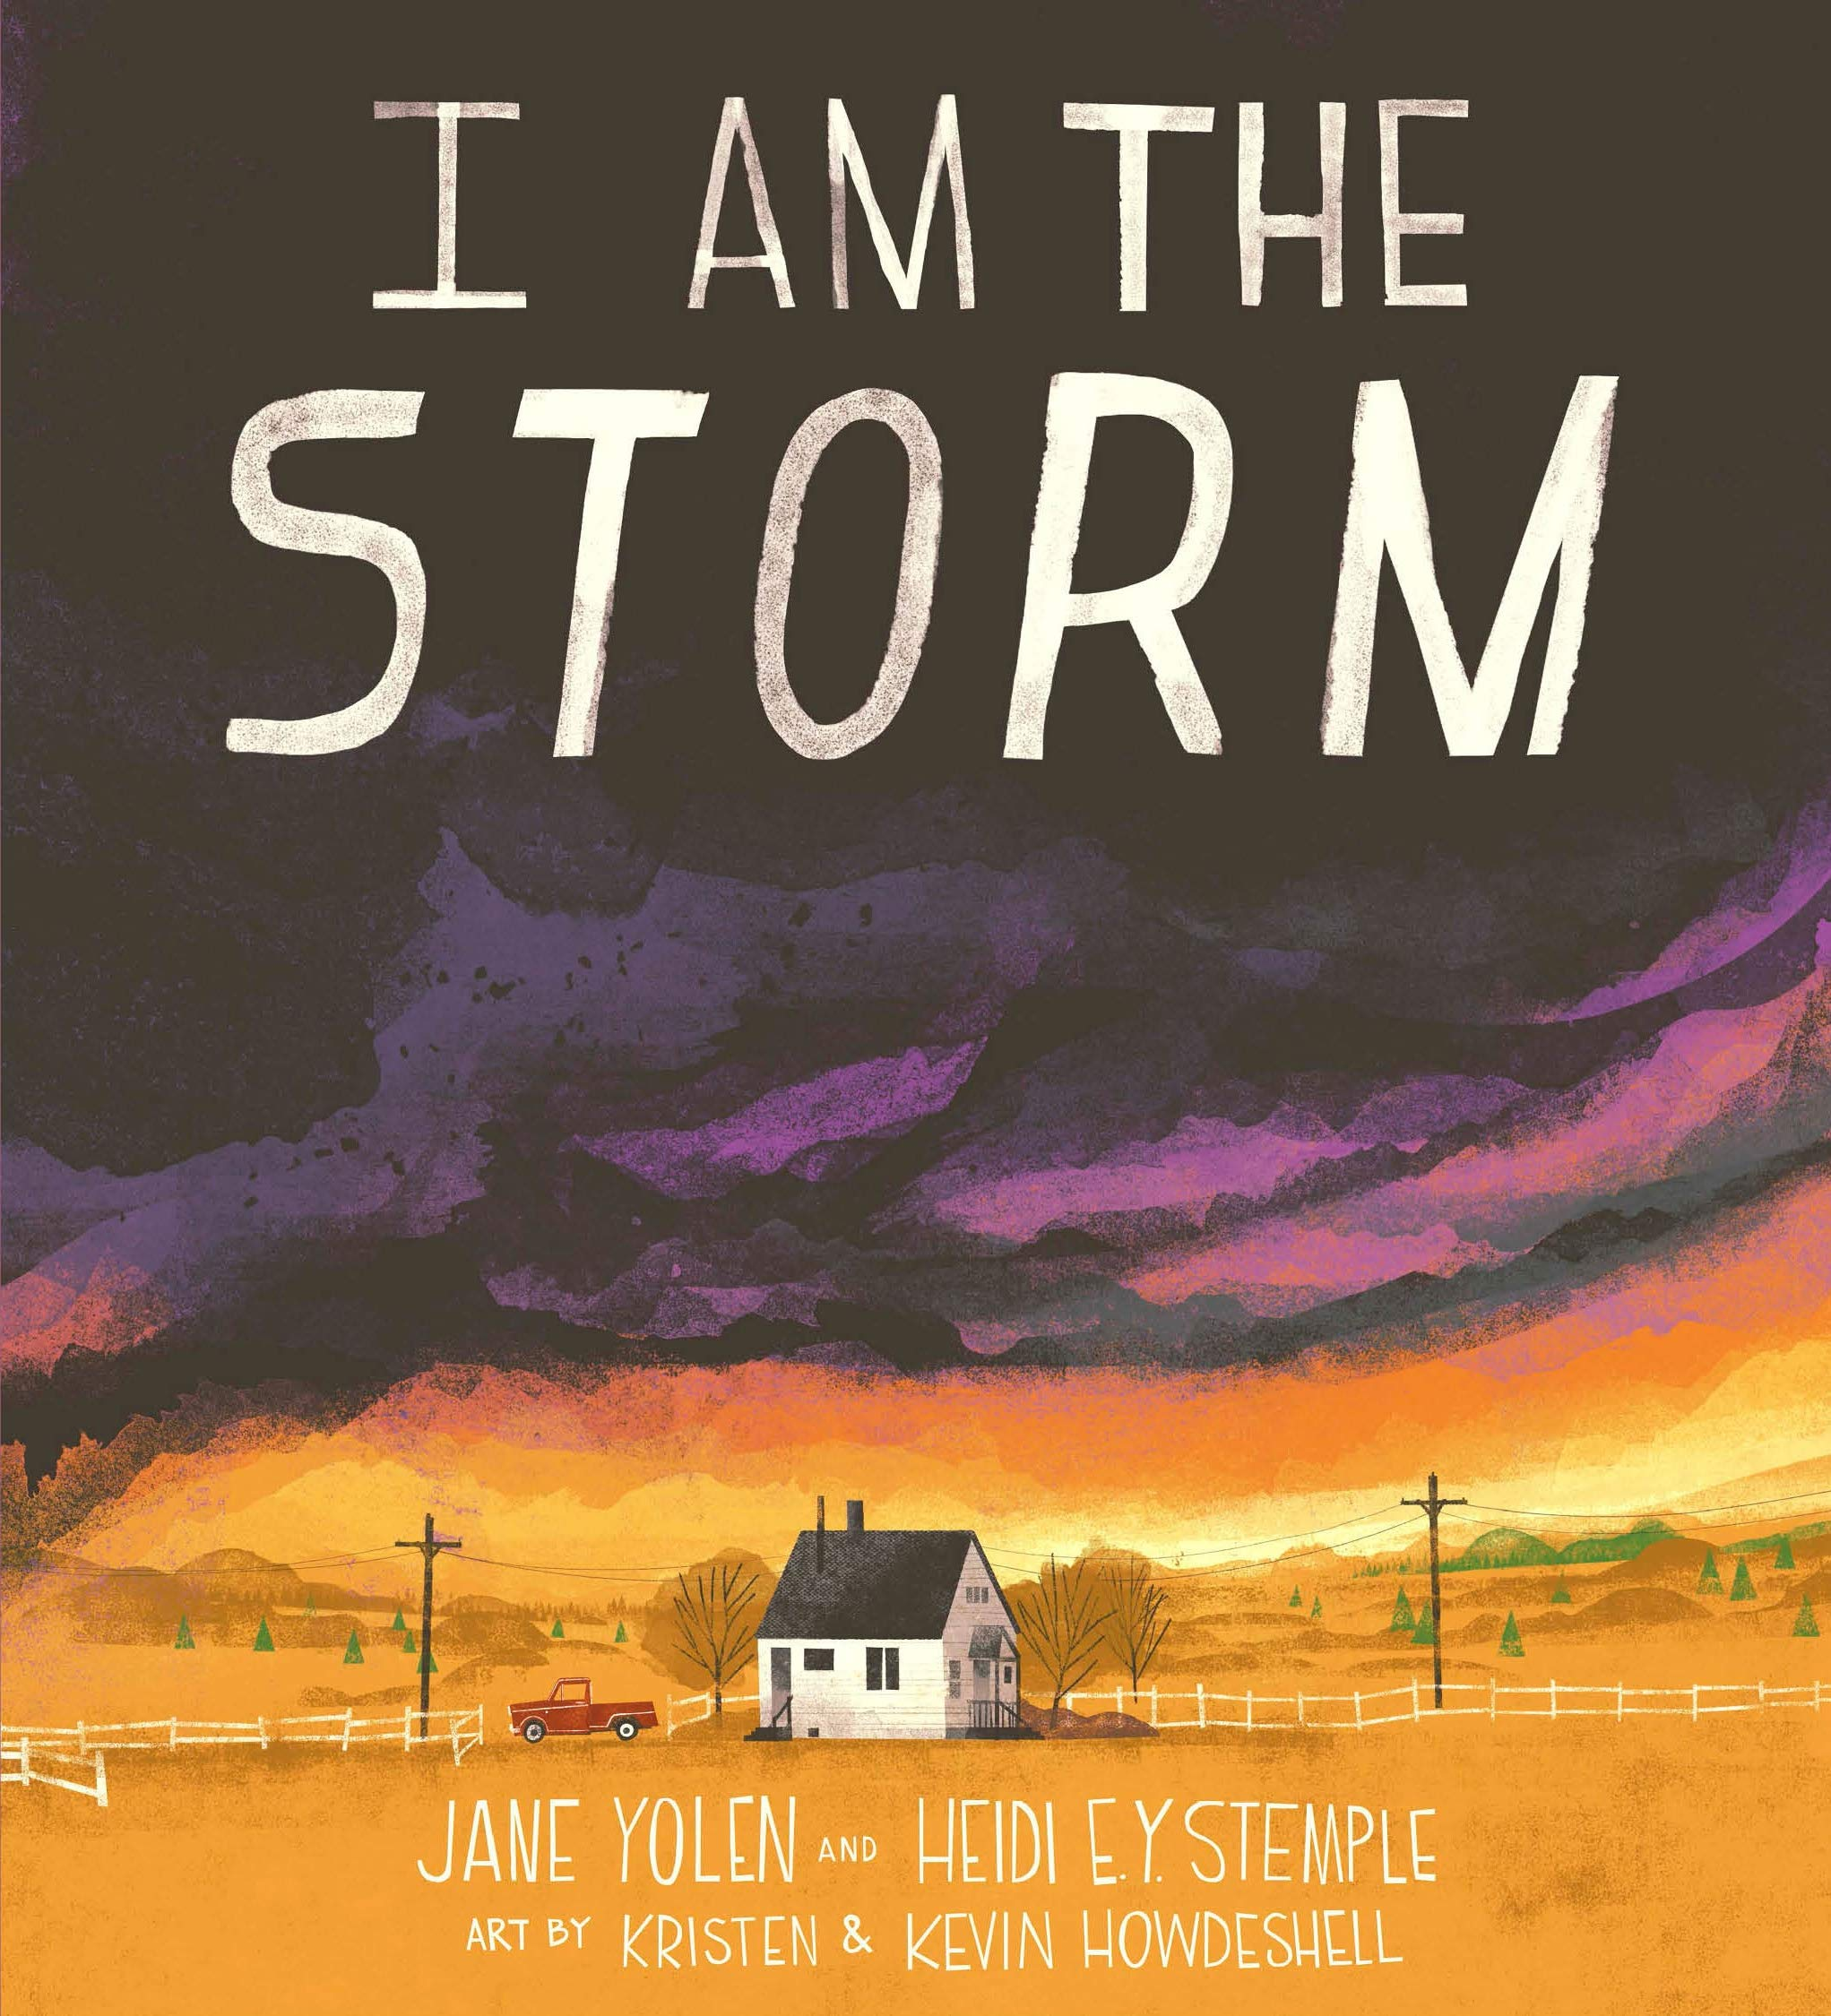 I Am the Storm: Yolen, Jane, Stemple, Heidi E. Y., Howdeshell, Kristen,  Howdeshell, Kevin: 9780593222751: Amazon.com: Books